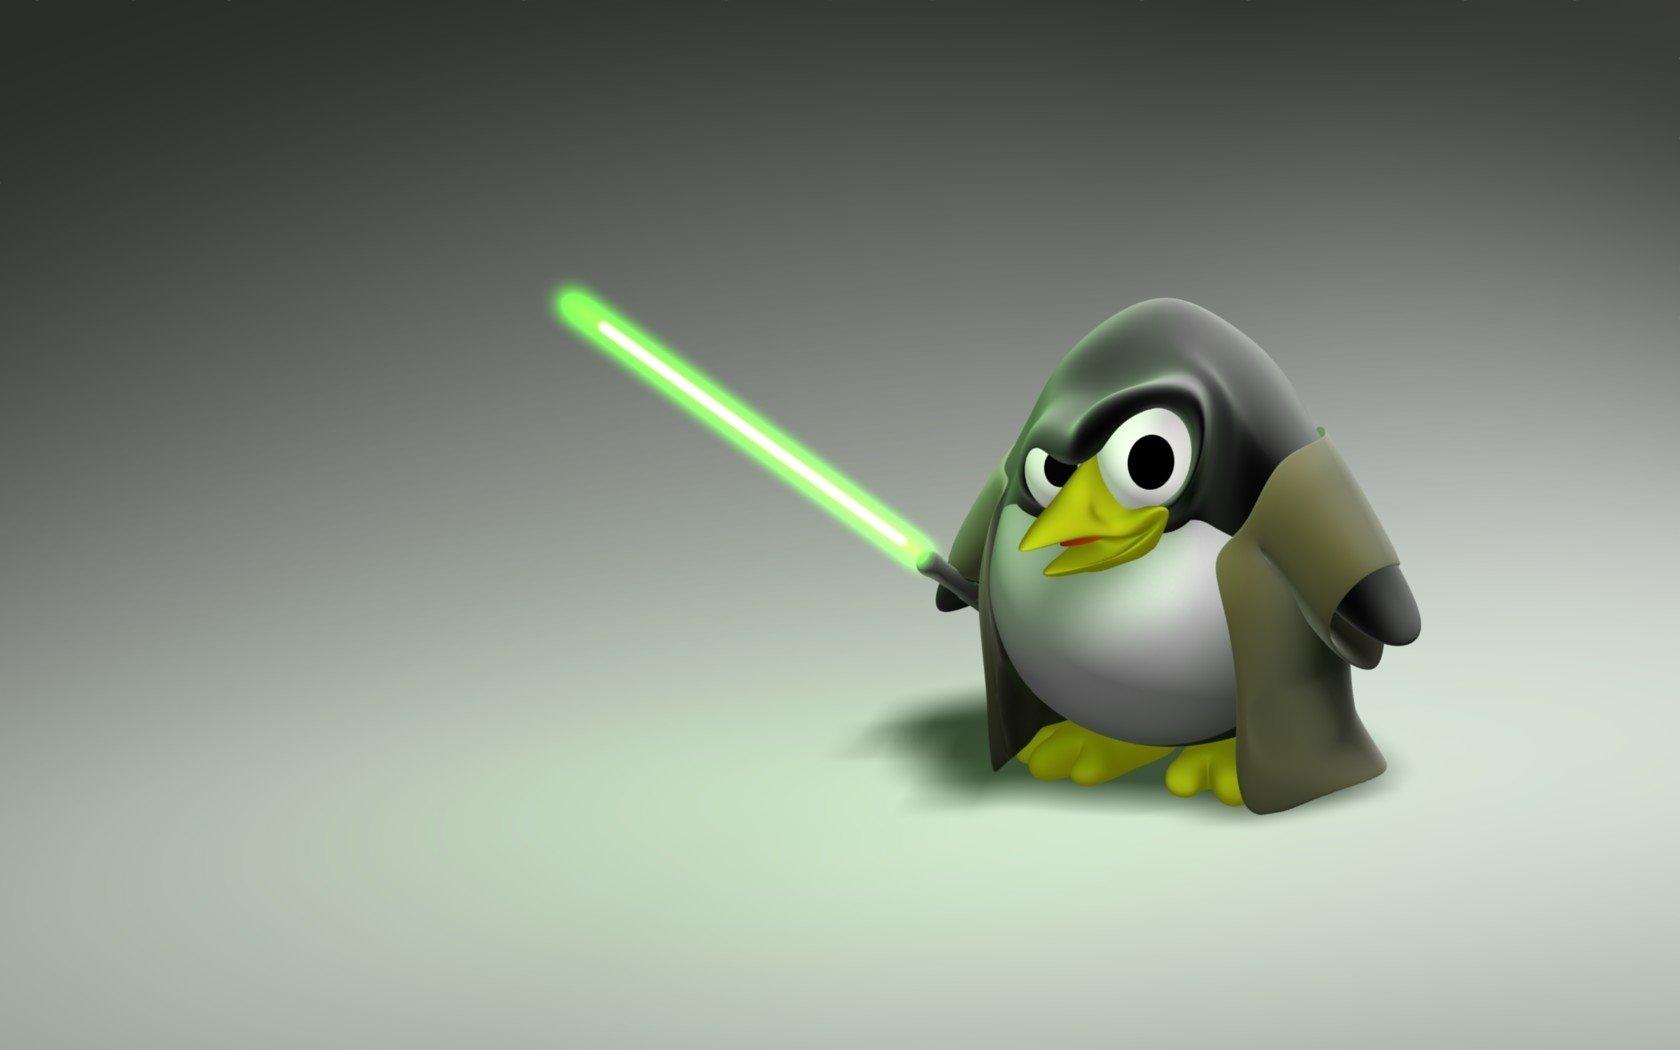 Cartoon Linux Wallpaper